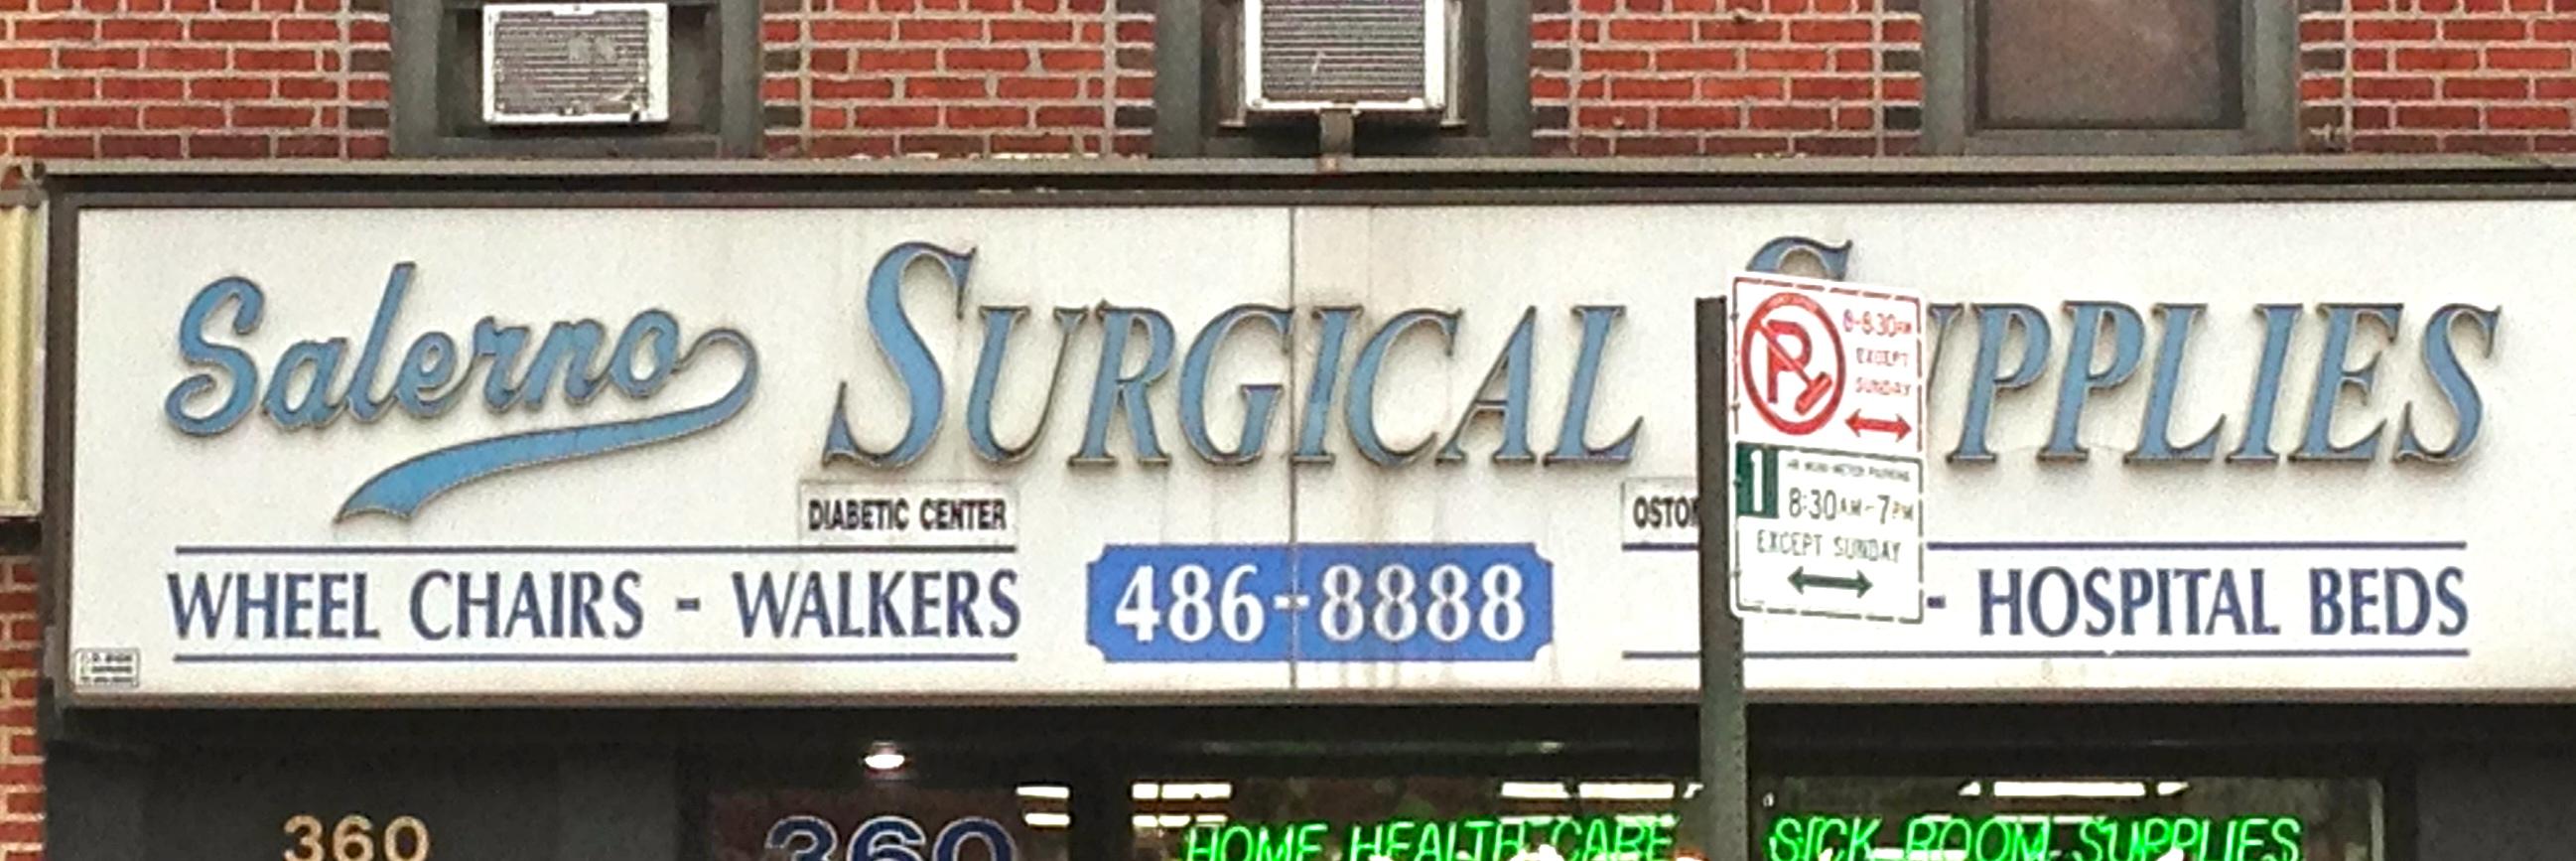 Salerno Surgical Supplies Brooklyn | Ephemeral New York